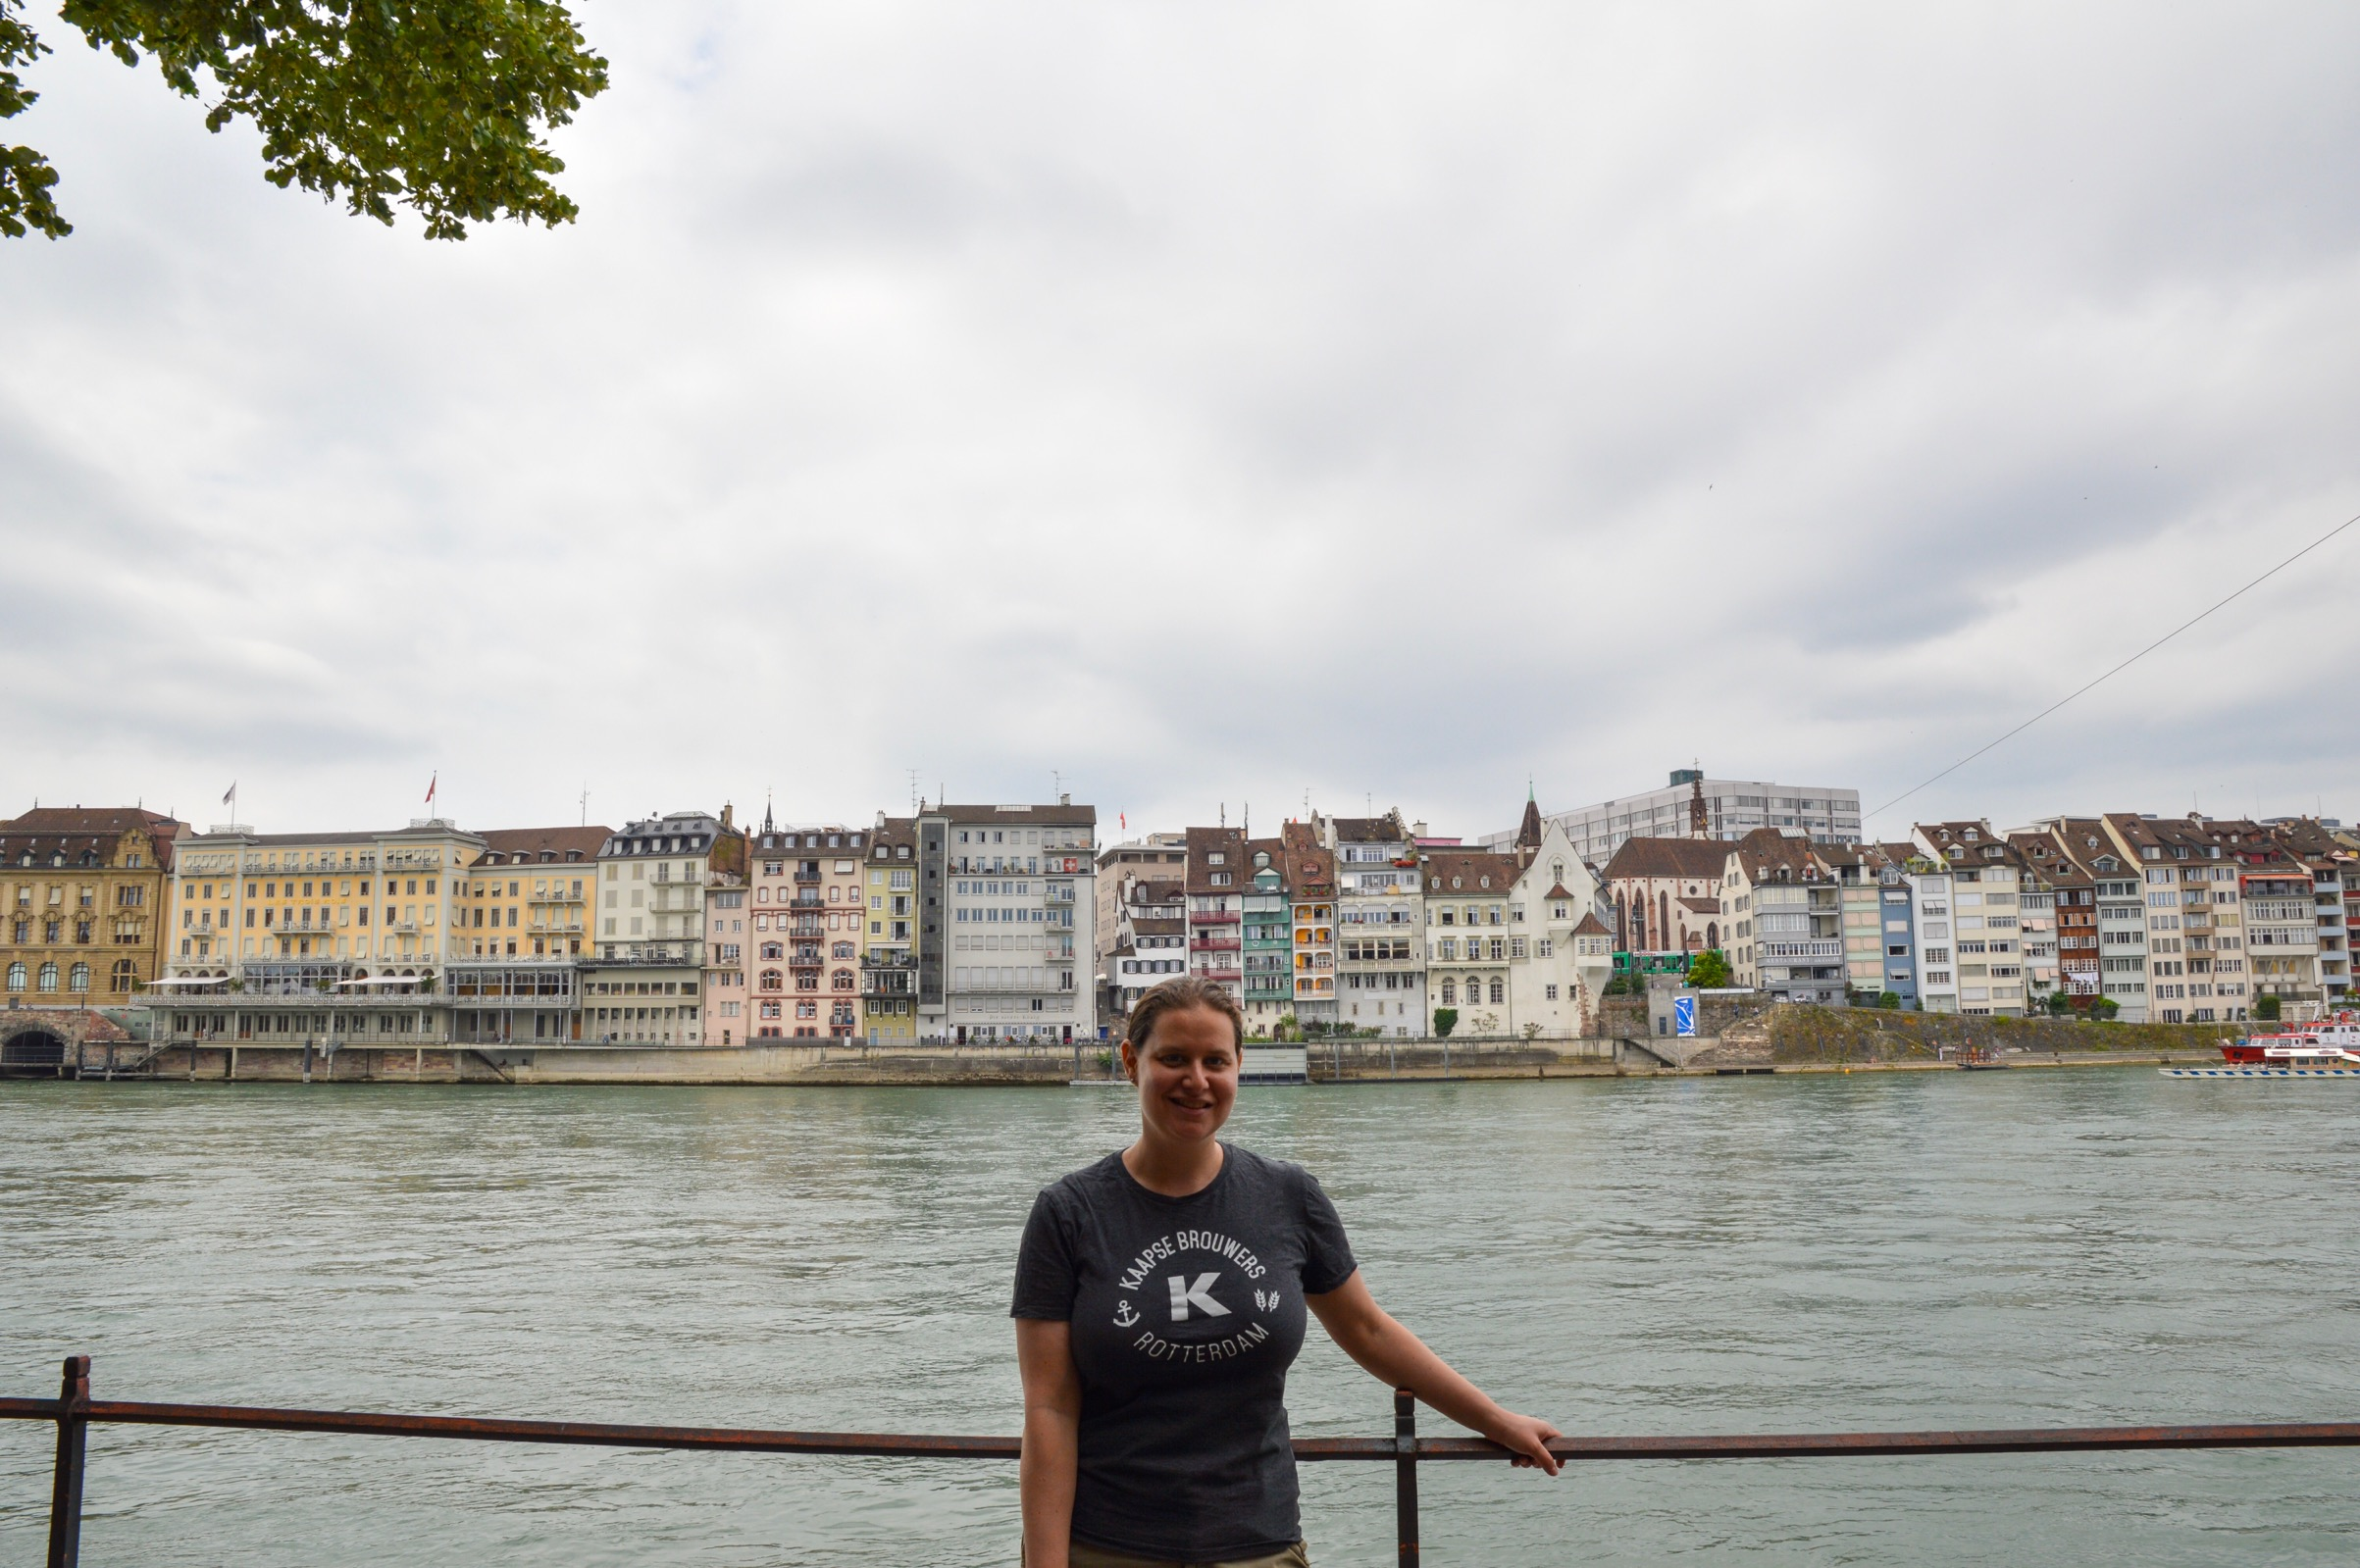 Rhine River, Basel, Switzerland